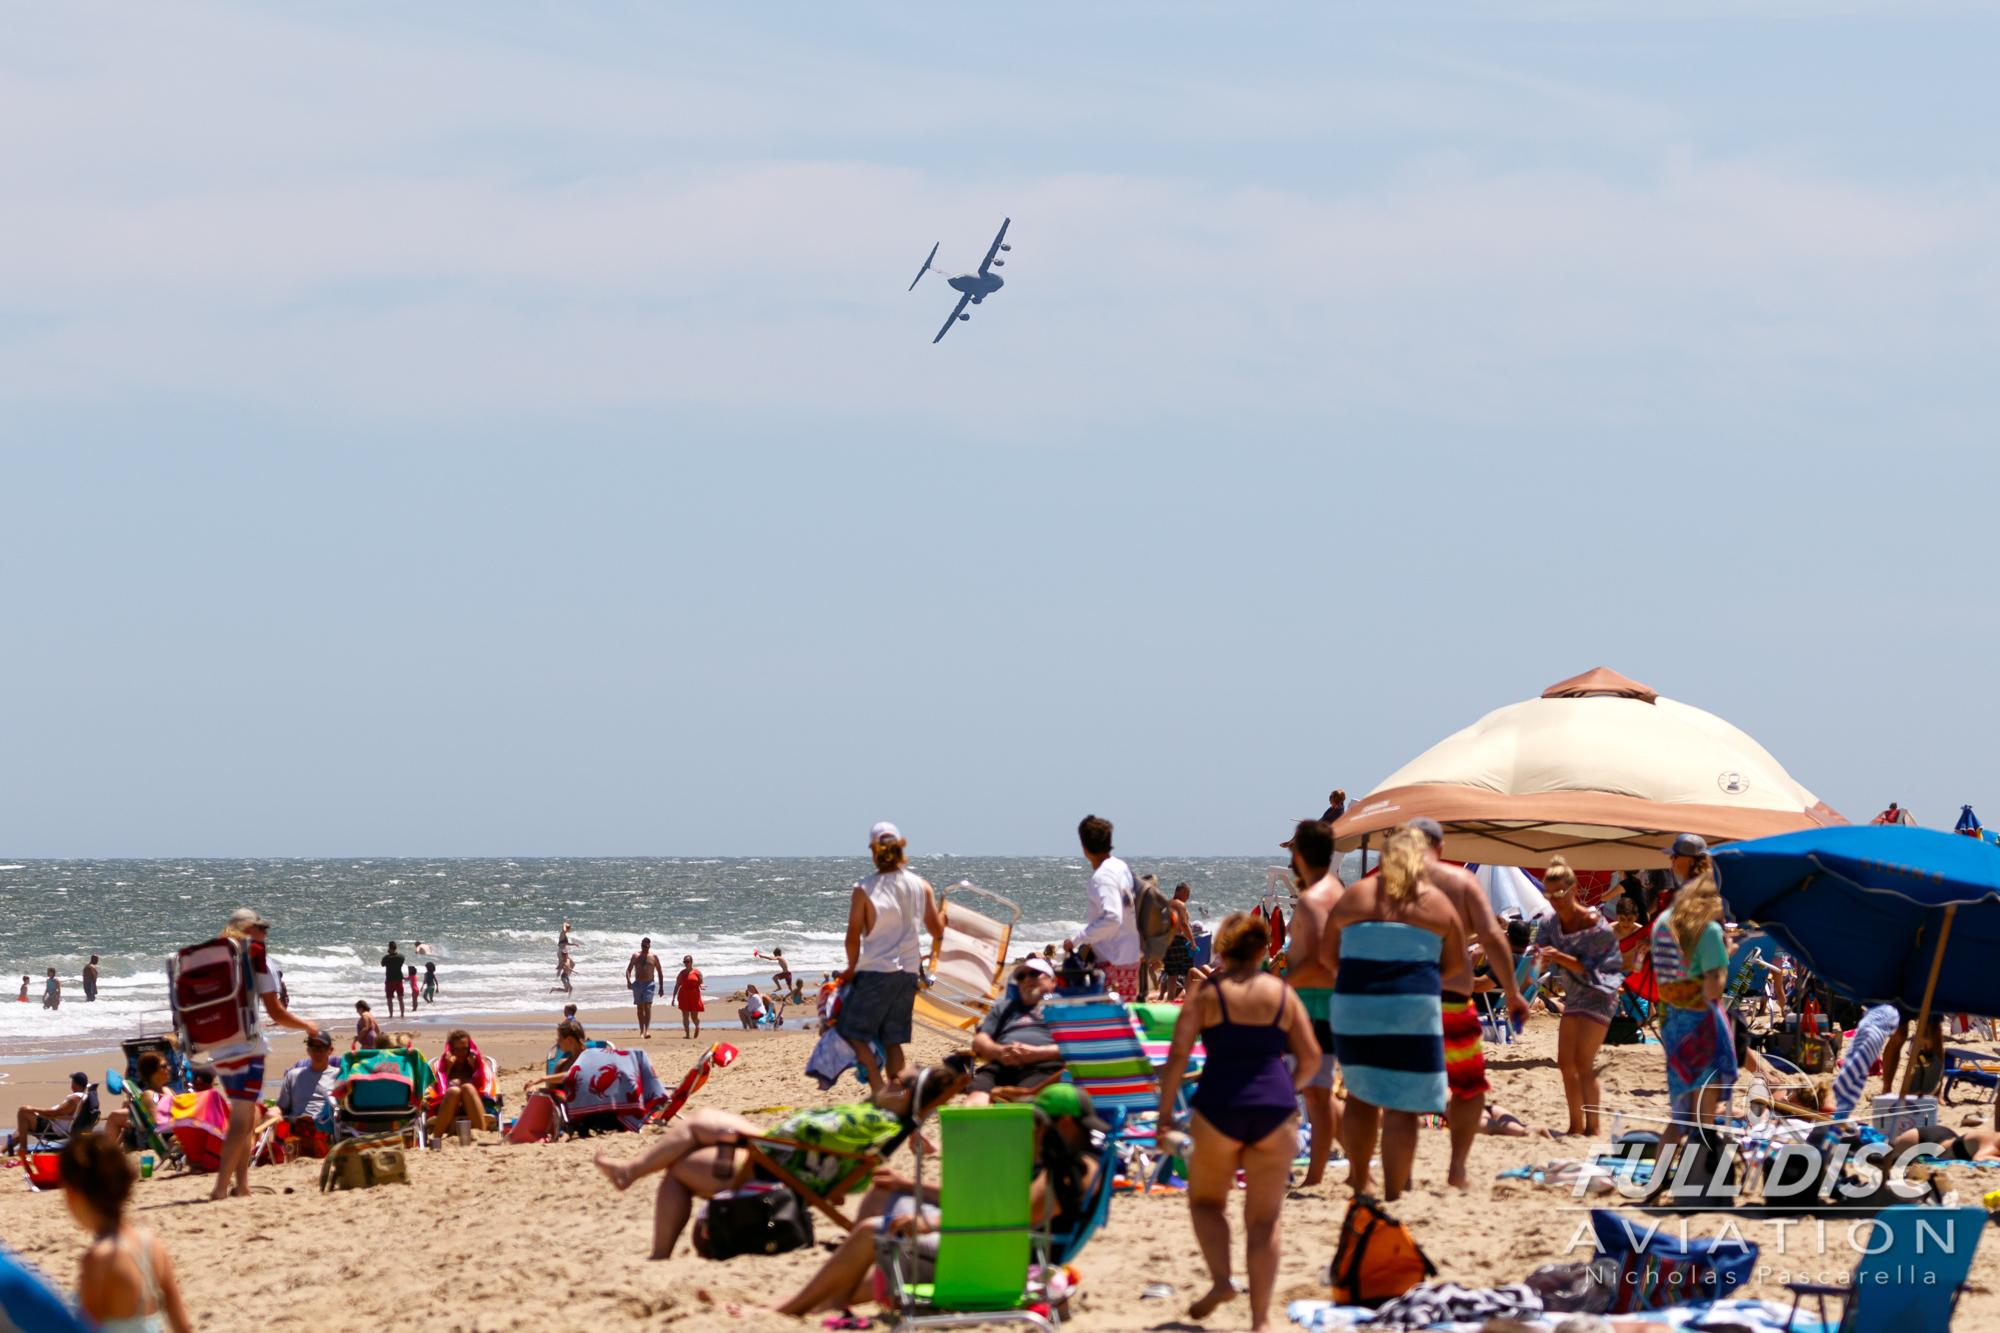 nickpascarella_fulldiscaviation_oceancityairshow_aviation_c17_scene_beach.jpg